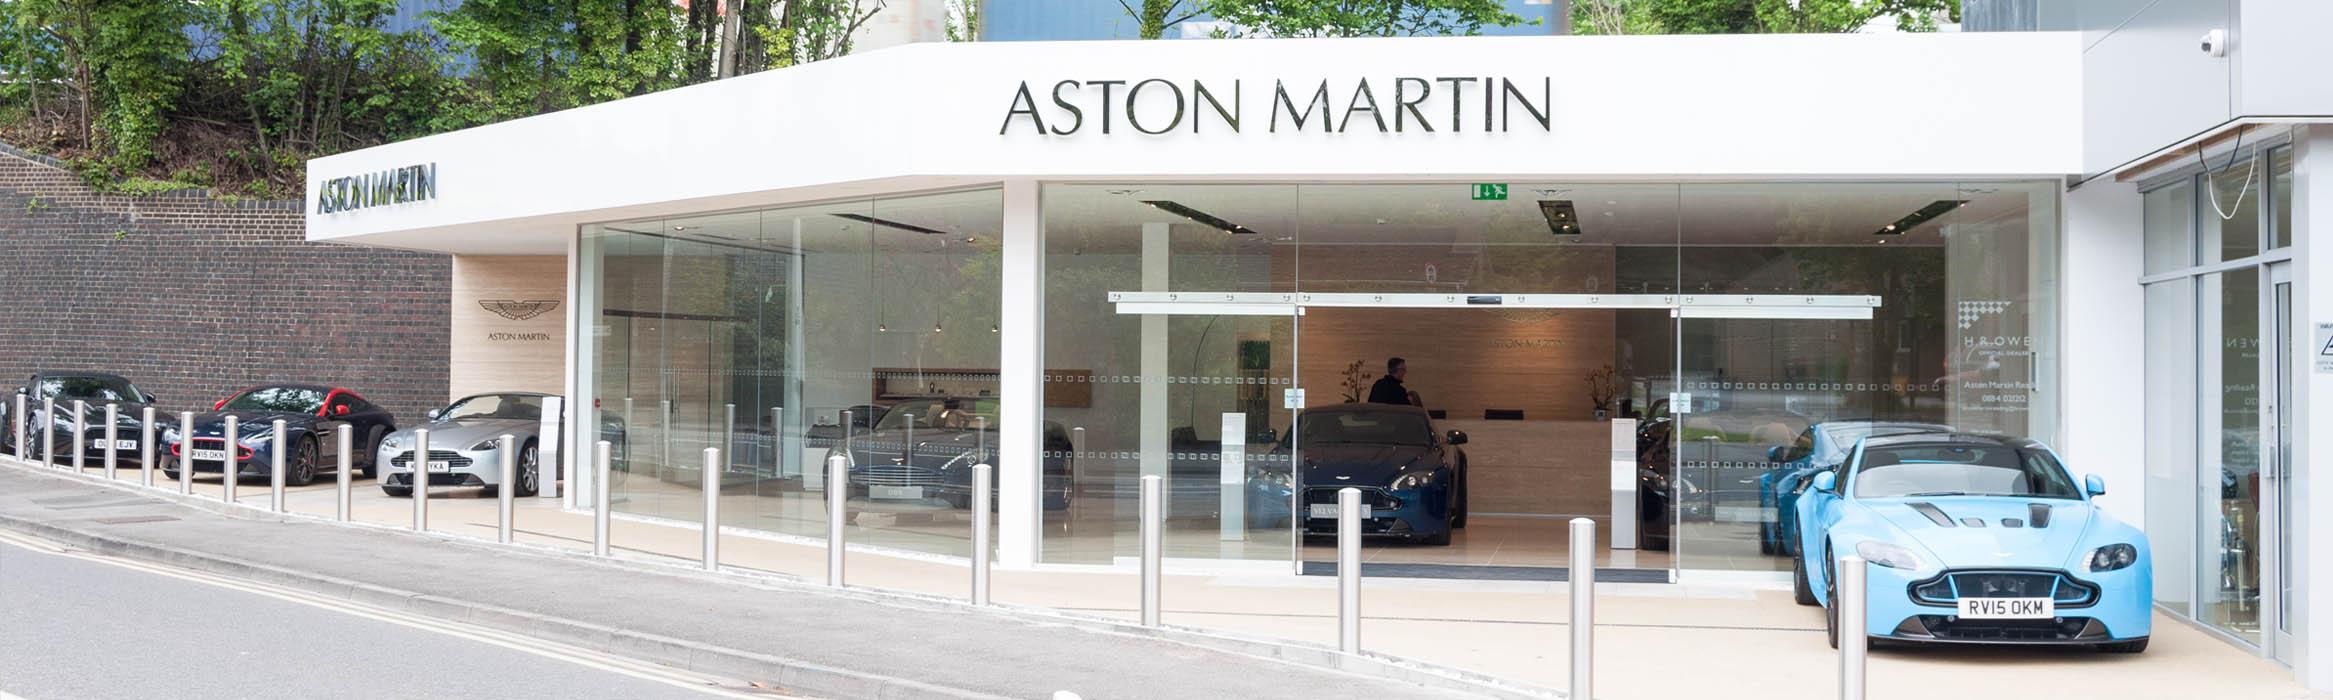 Aston Martin Reading